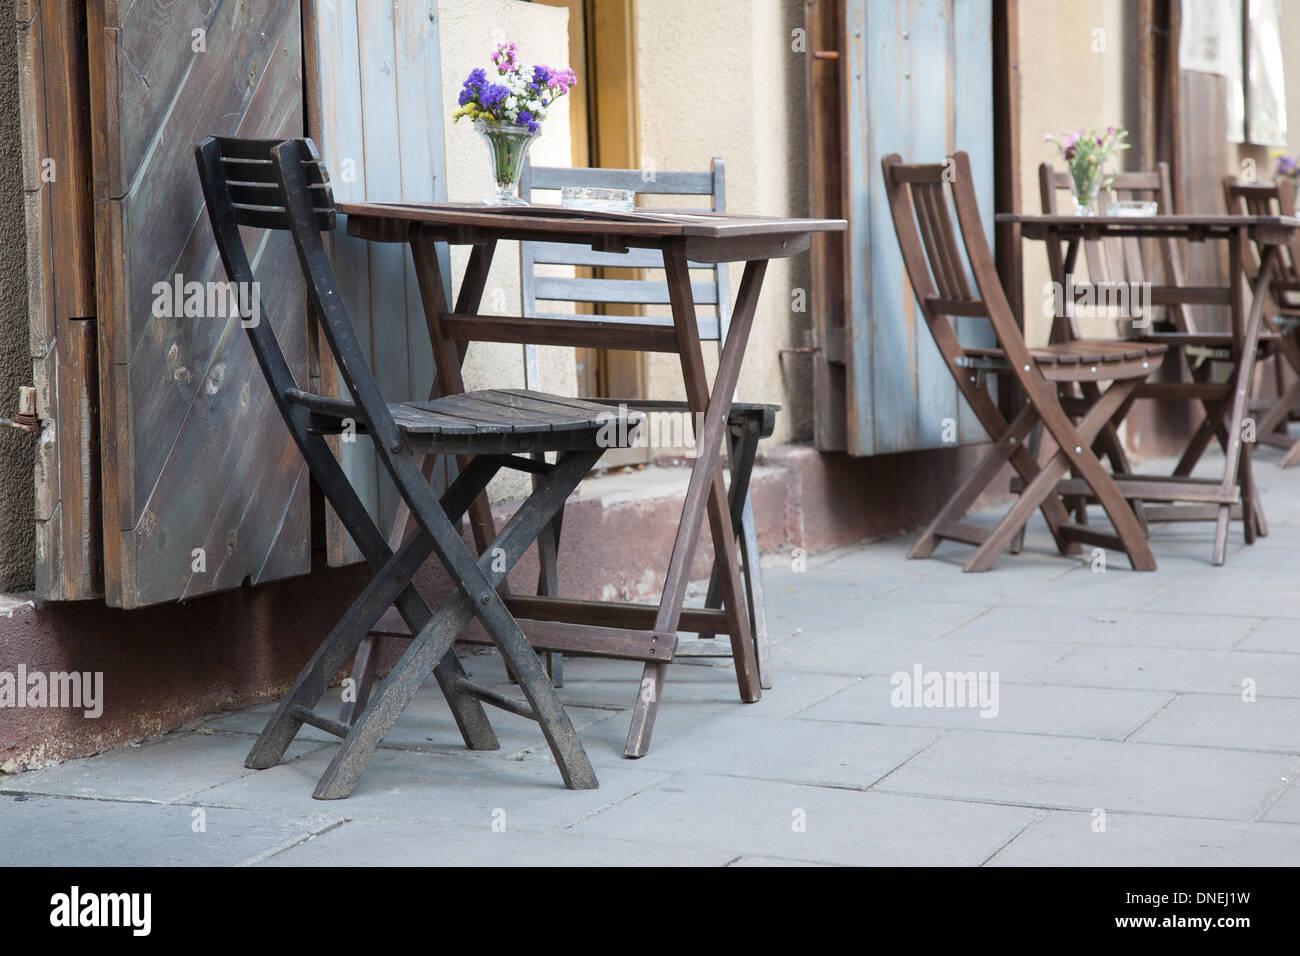 cafe cracow krakow tables stockfotos cafe cracow krakow tables bilder alamy. Black Bedroom Furniture Sets. Home Design Ideas